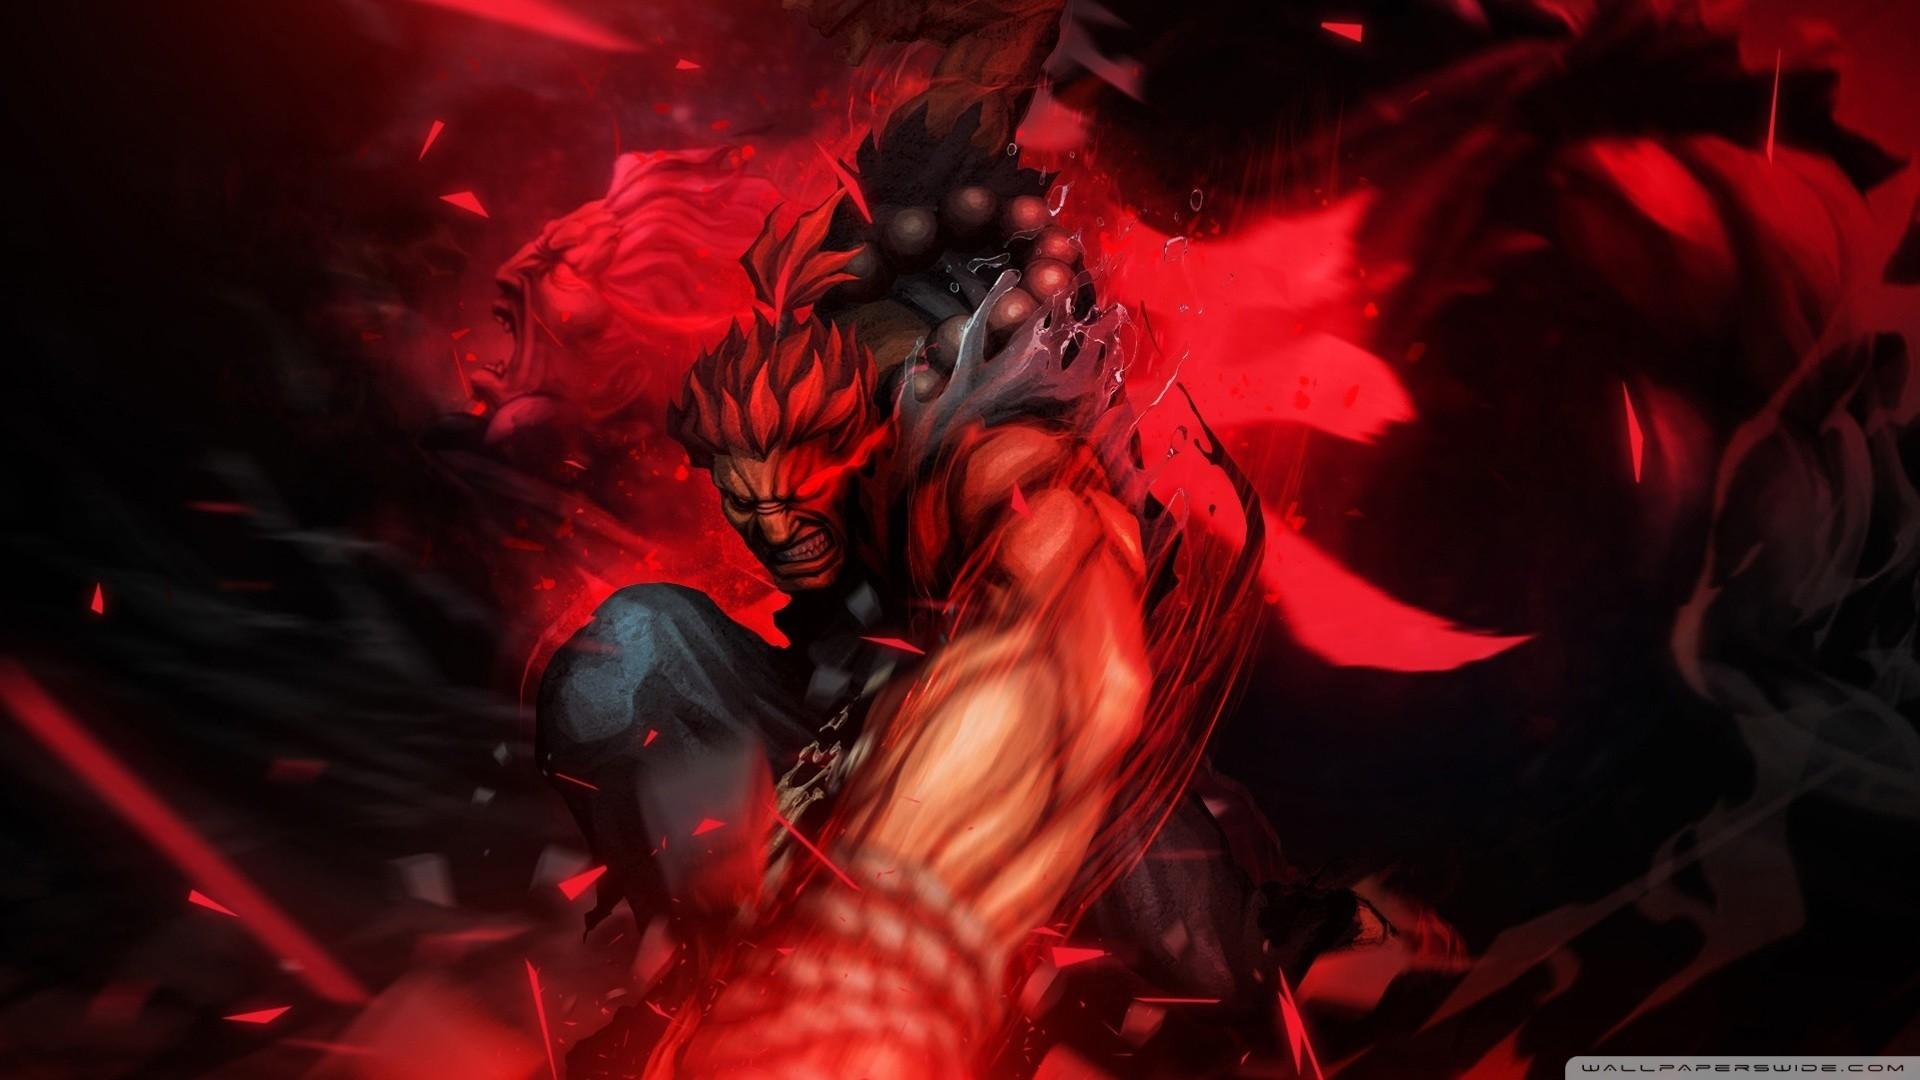 sakura wallpaper street fighter (78+ images)